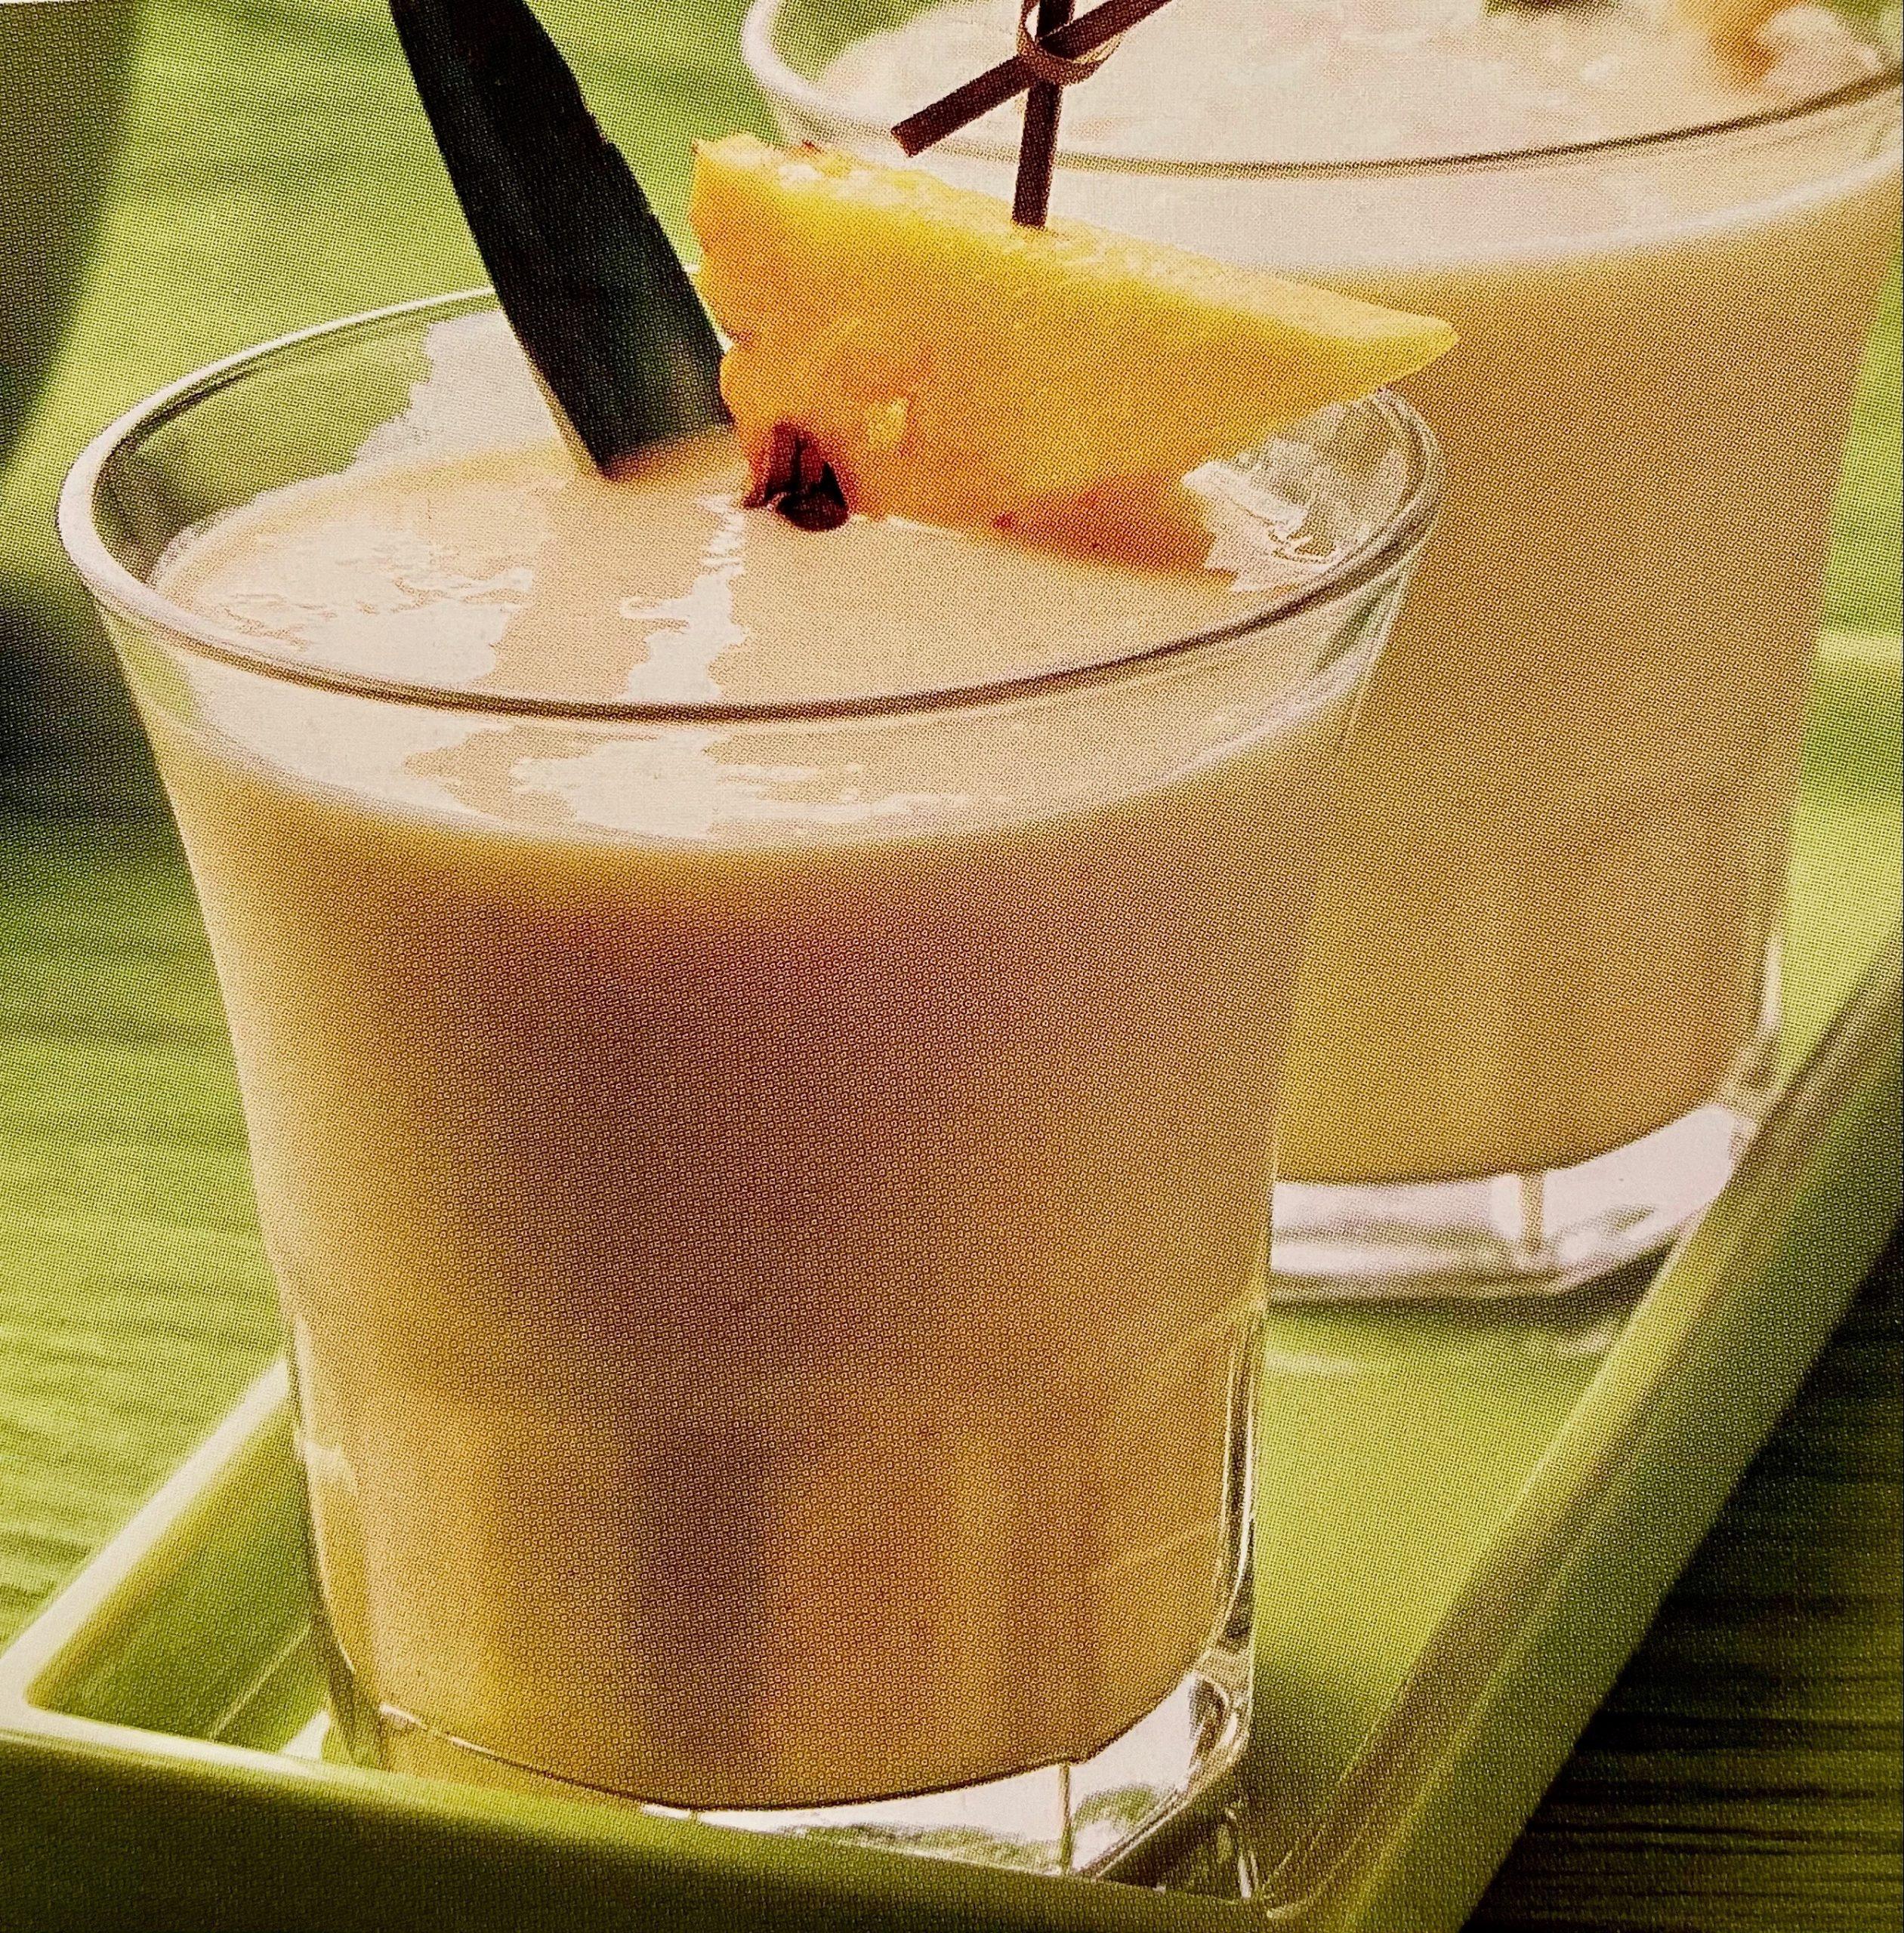 Pineapple Banana Licuado